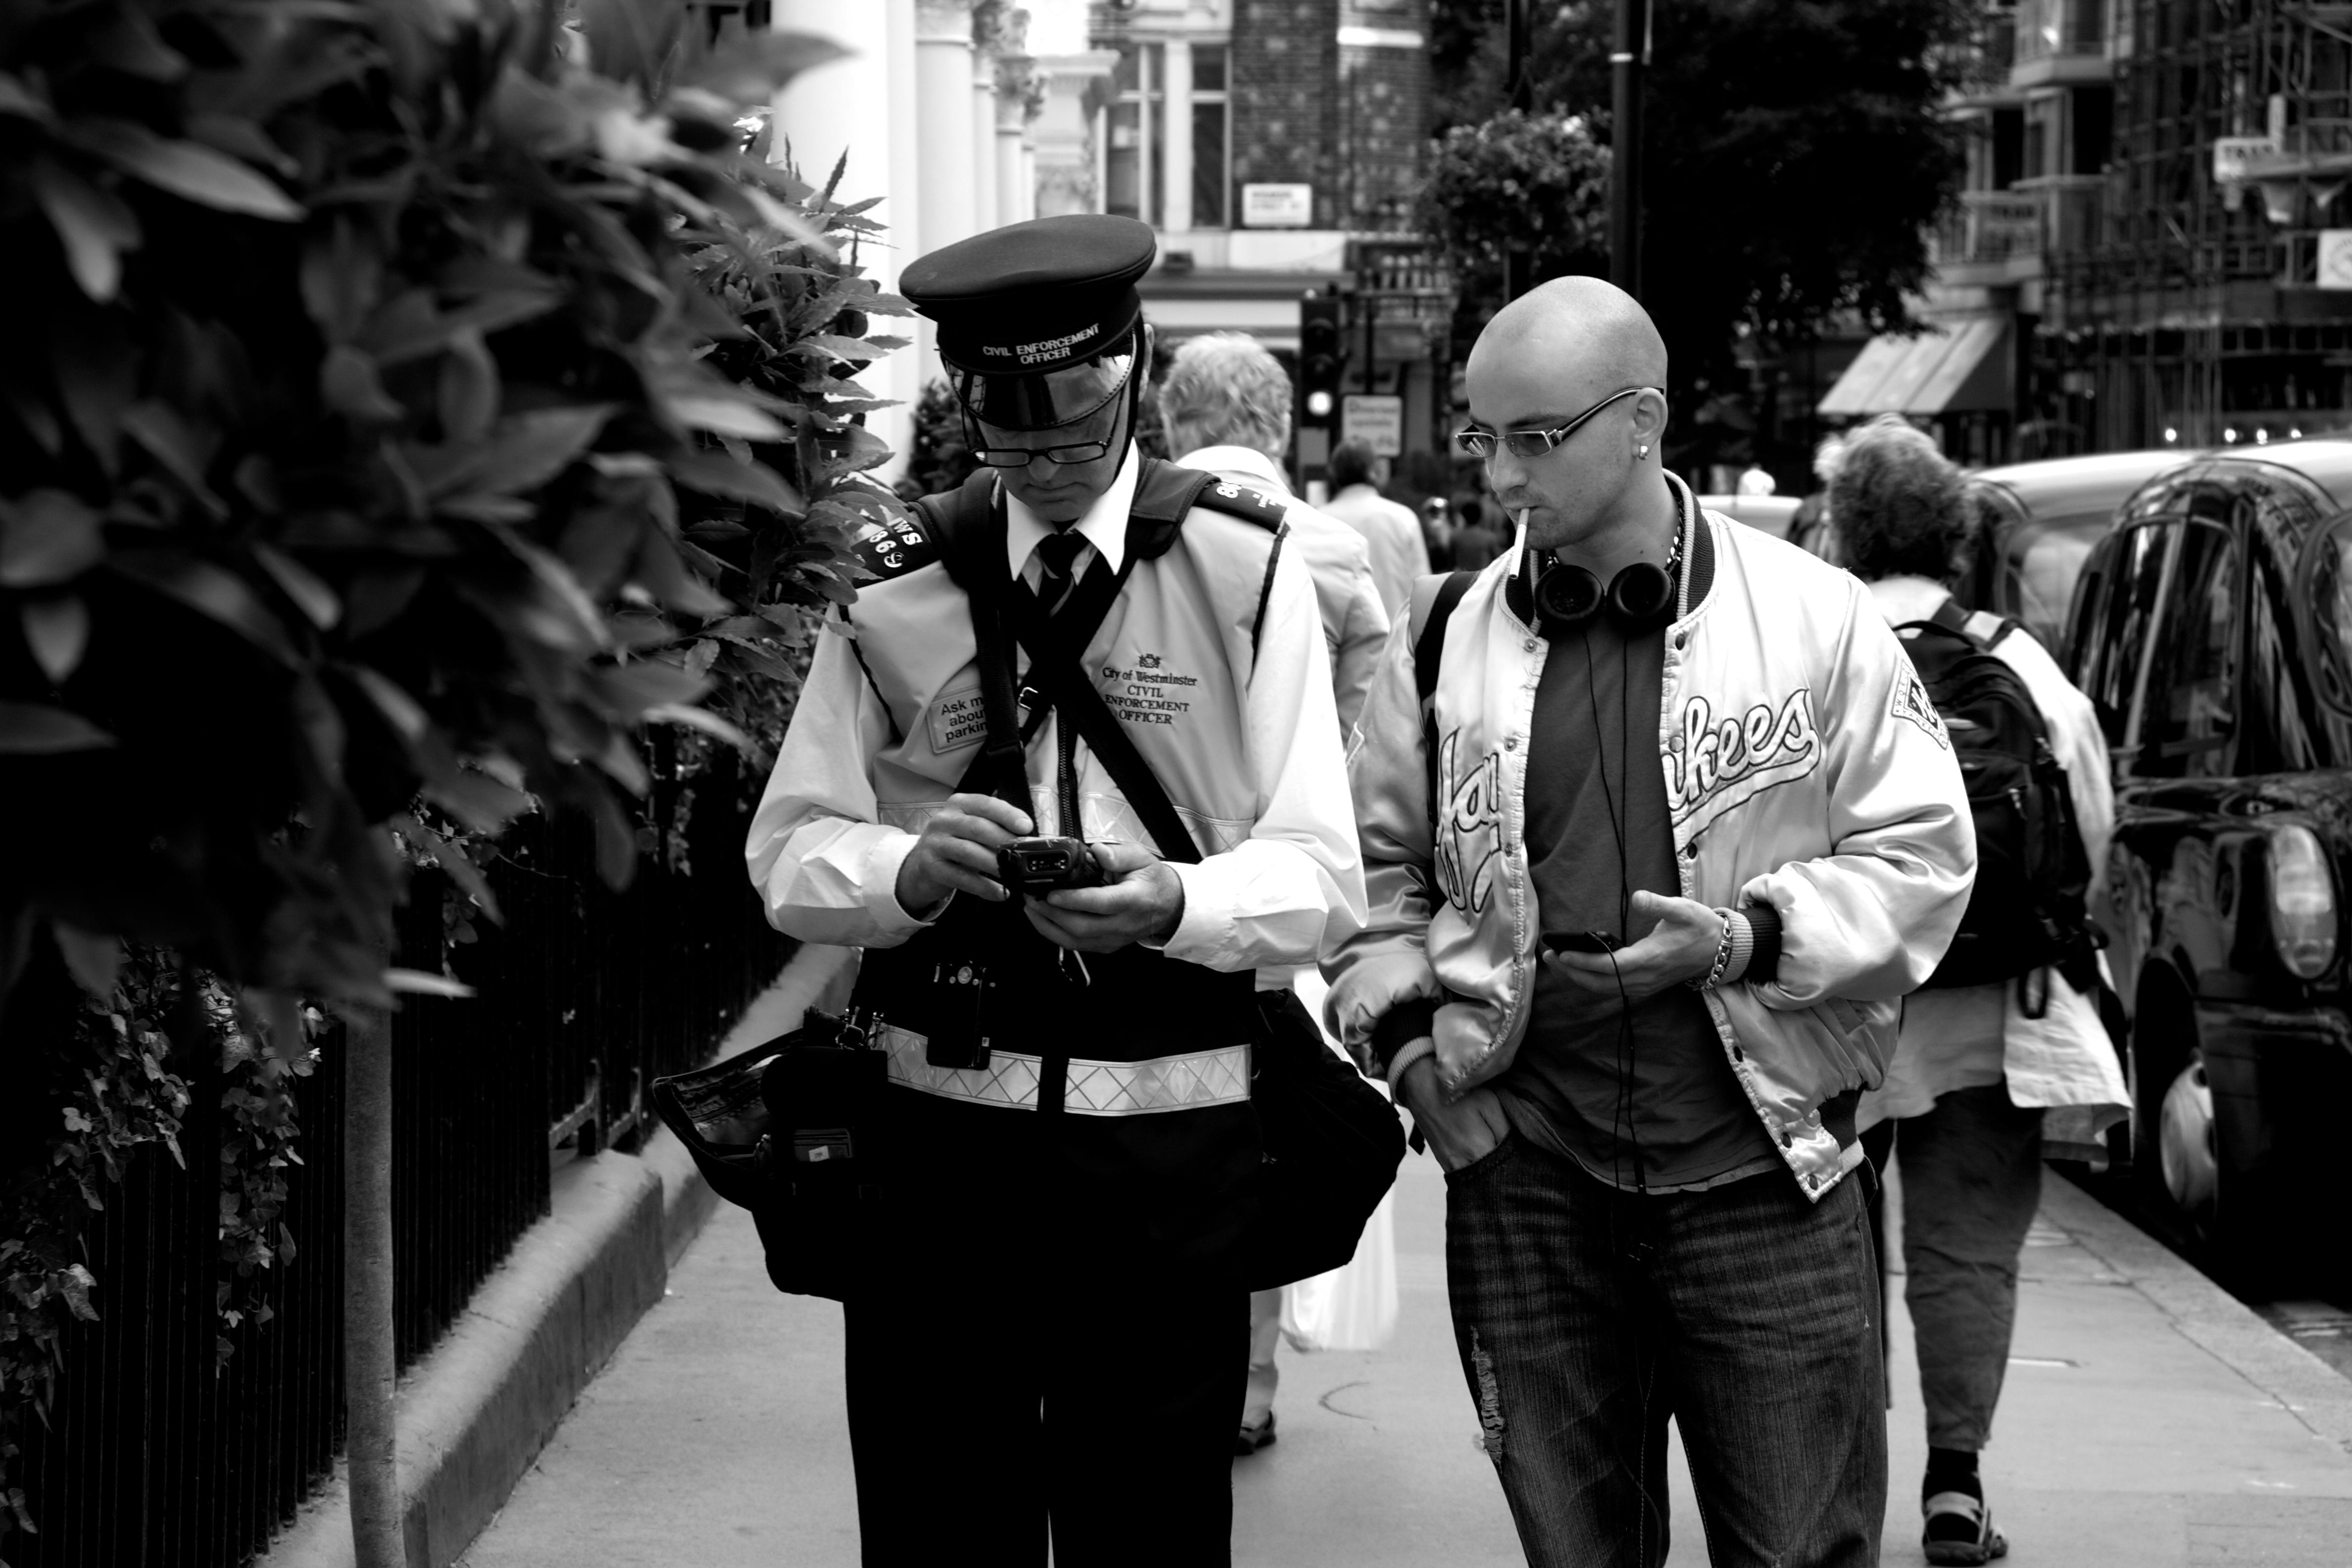 Man receives parking ticket on a London Street